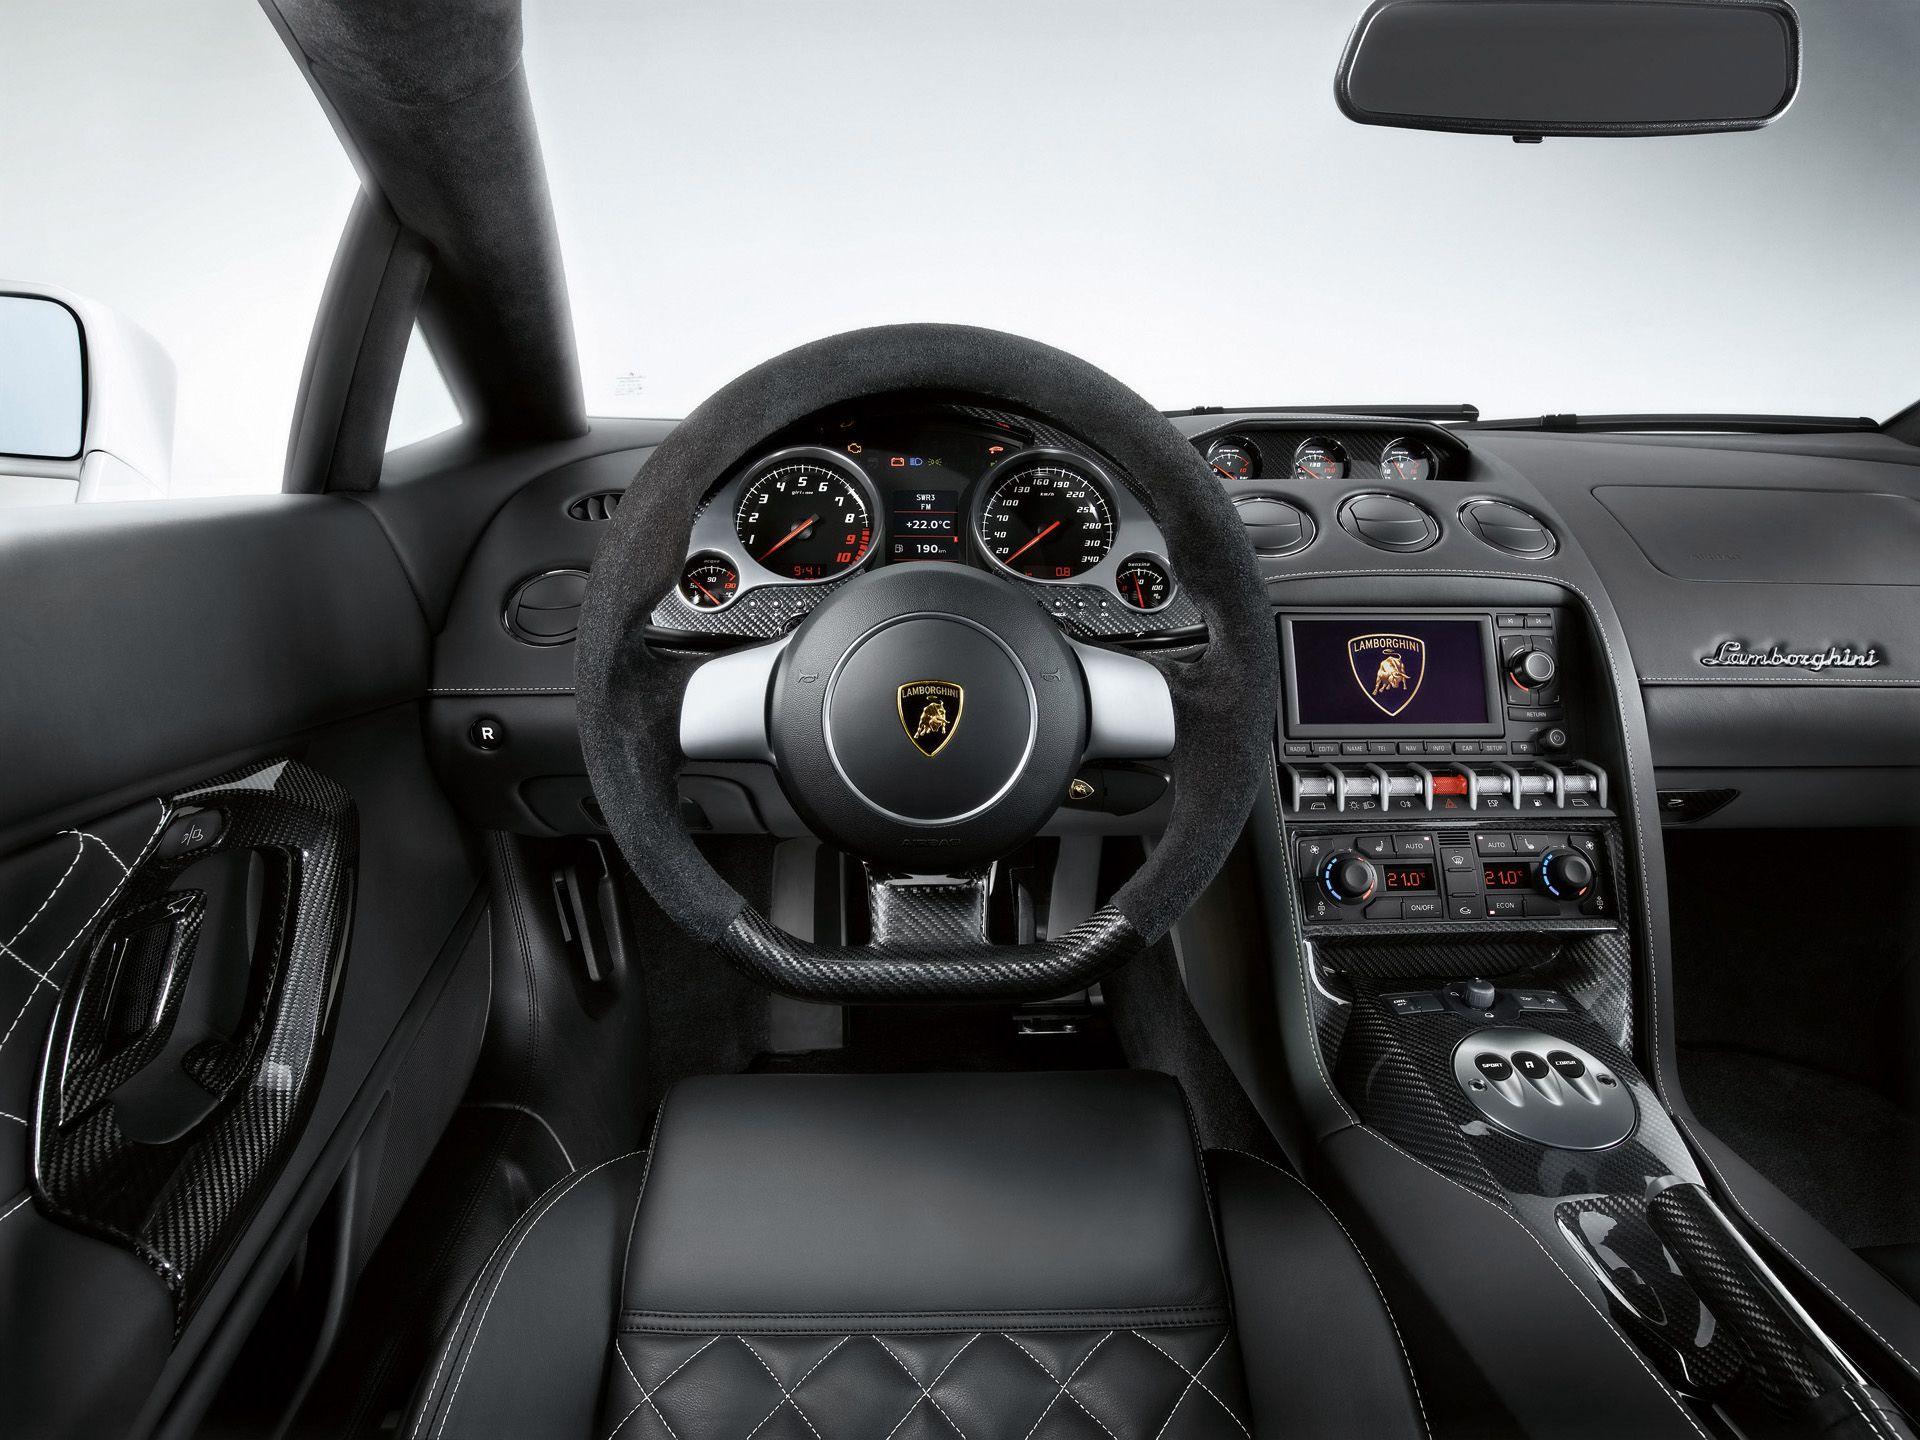 Lamborghini Gallardo Dashboard Cars Lamborghini Gallardo